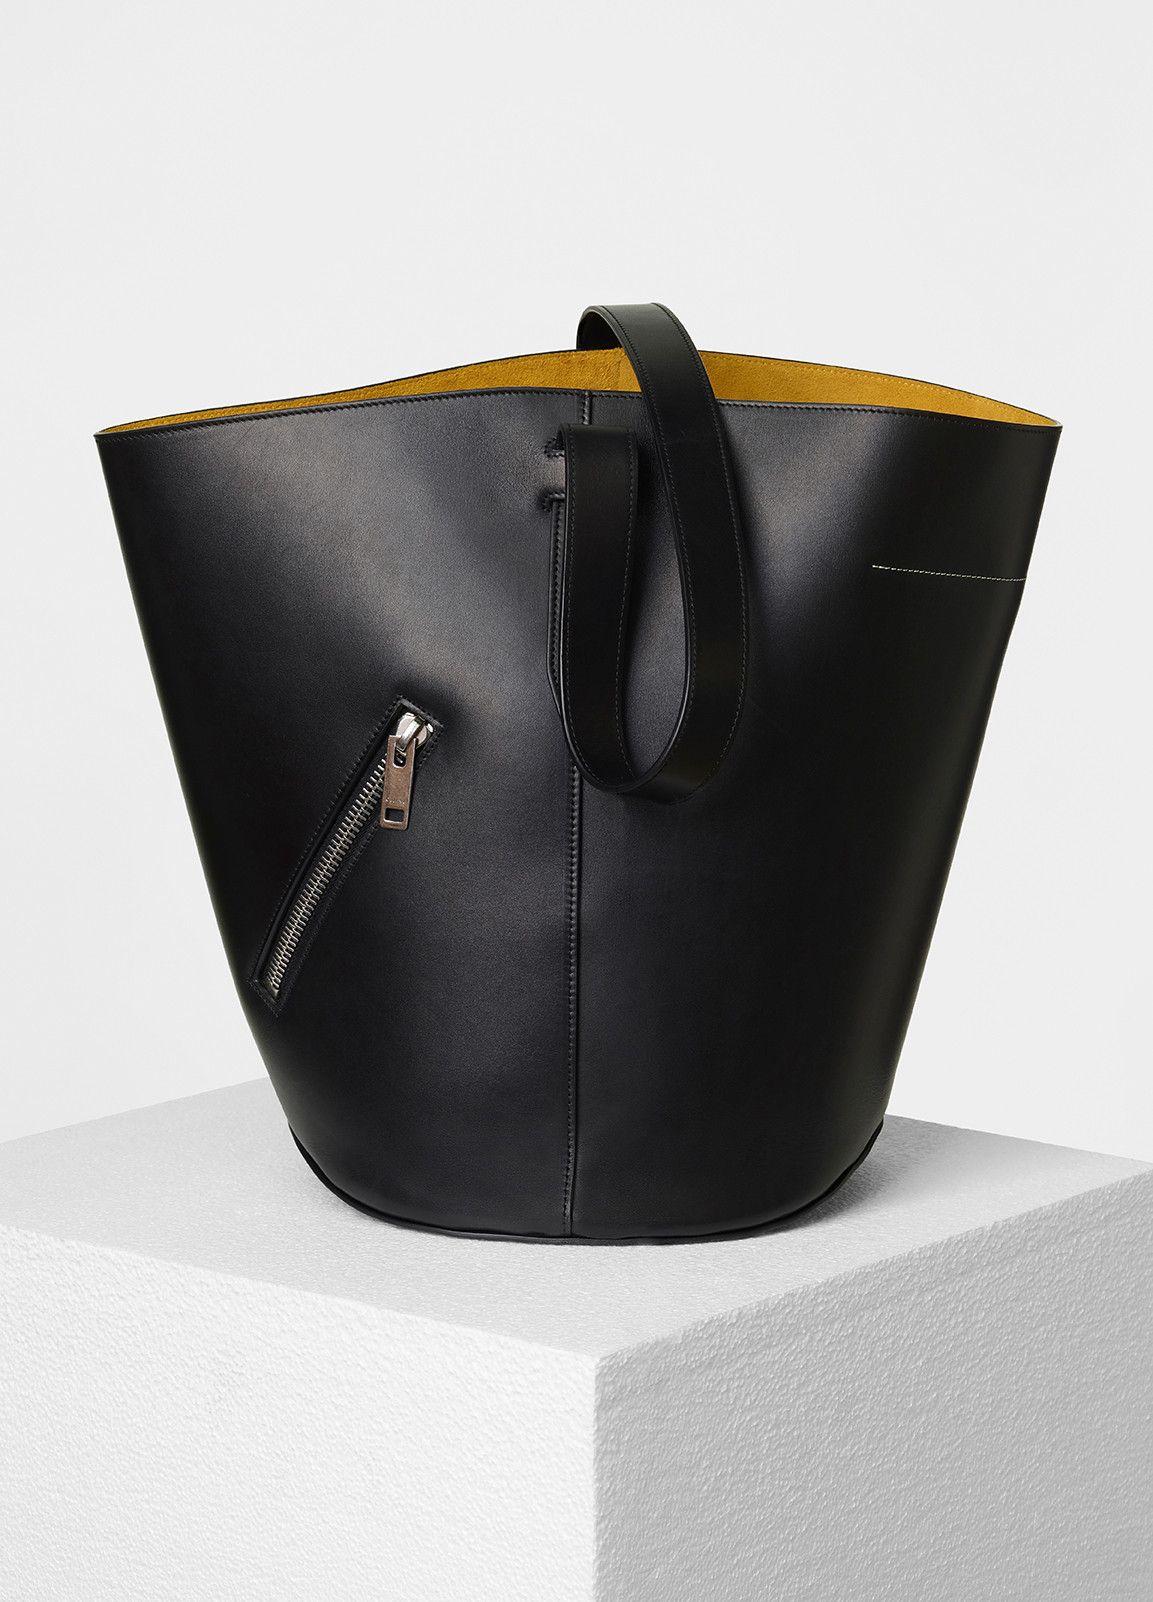 330c8c72b6e5 Bucket Biker Shoulder Bag in Natural Calfskin - Céline